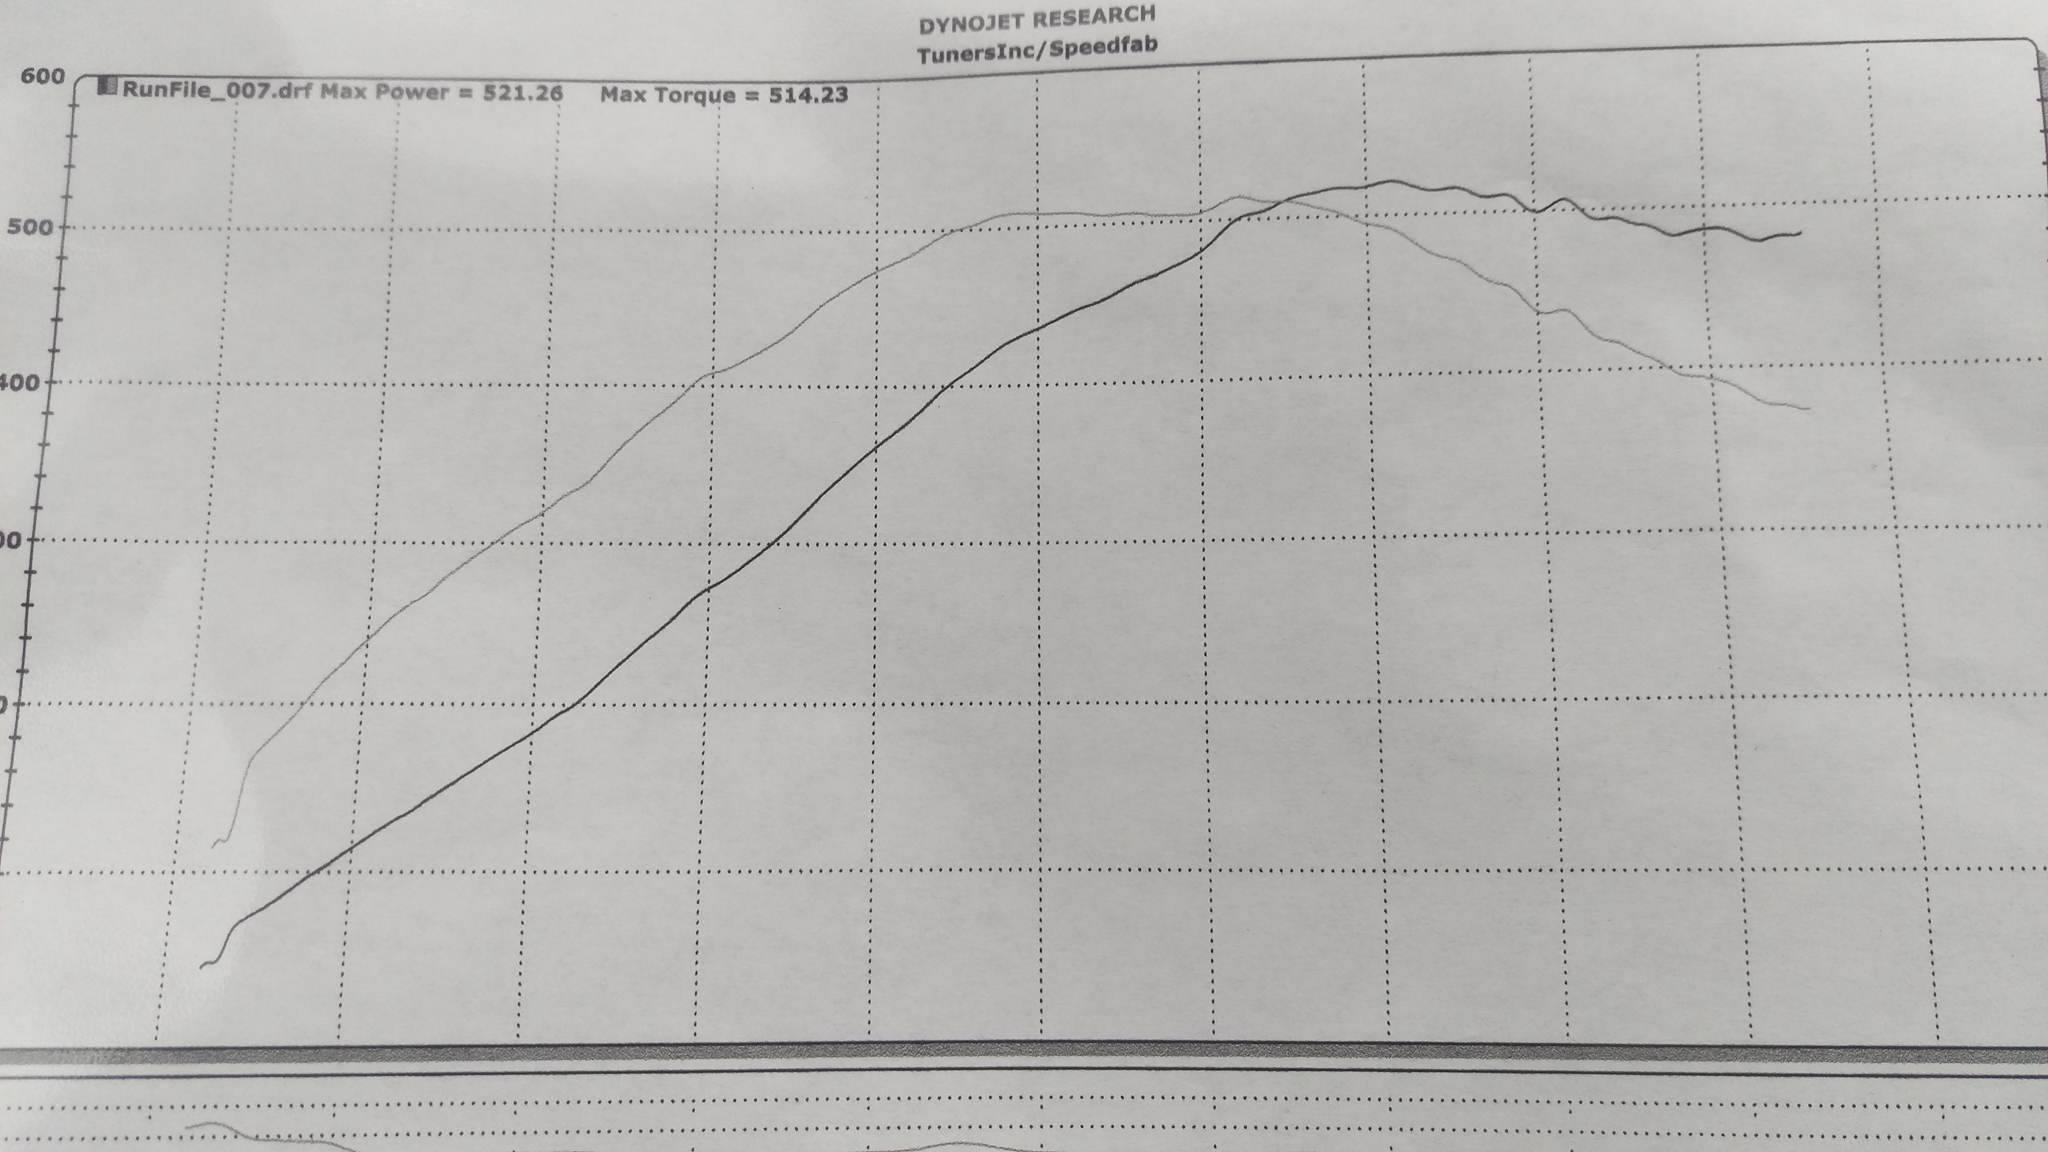 EFR 7163 Focus ST, 521 WHP. 514 WTQ